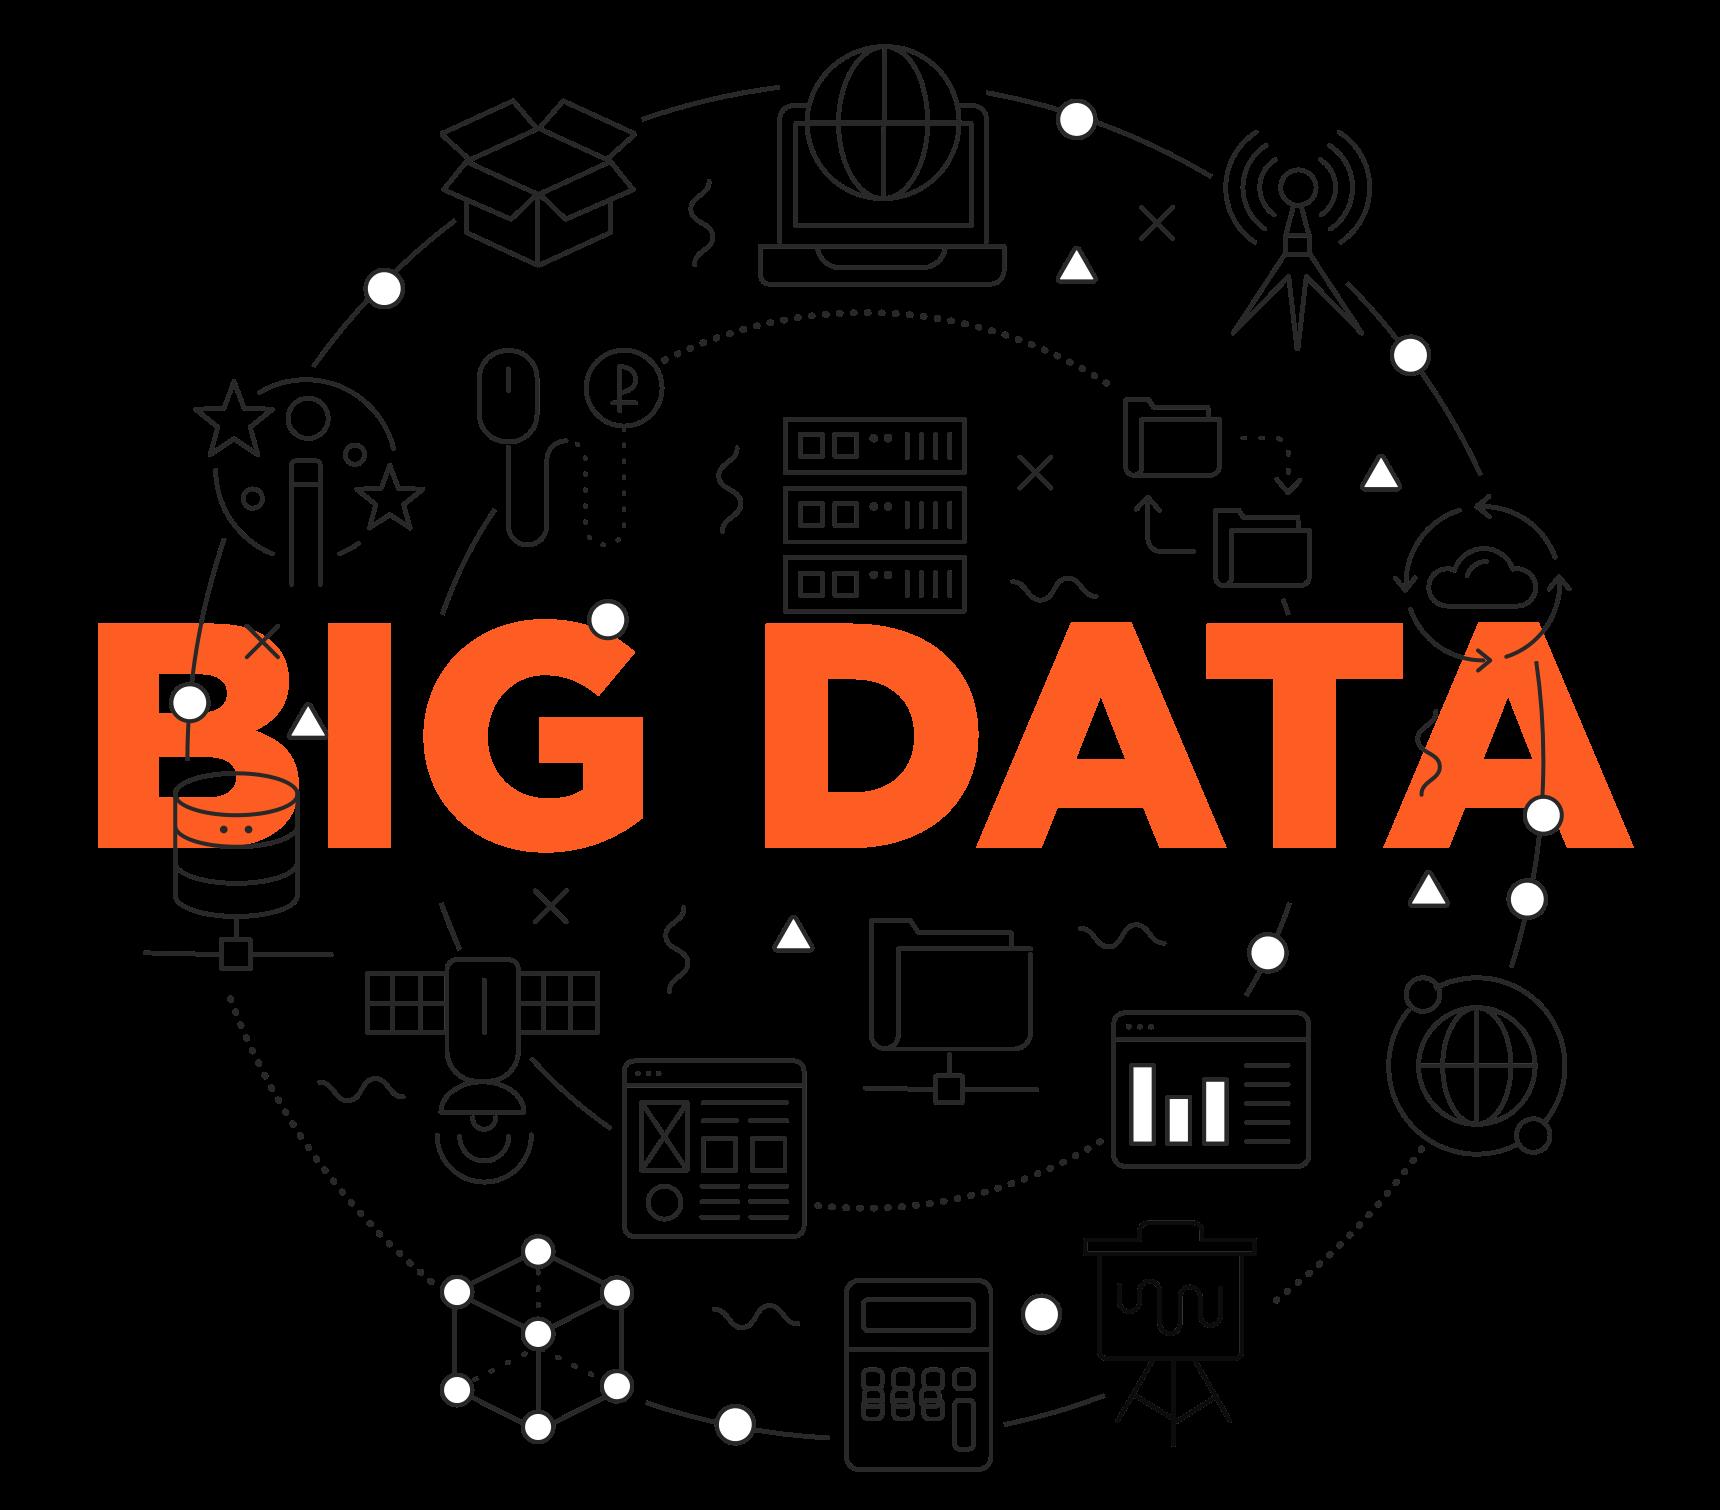 Big Data چیست؟